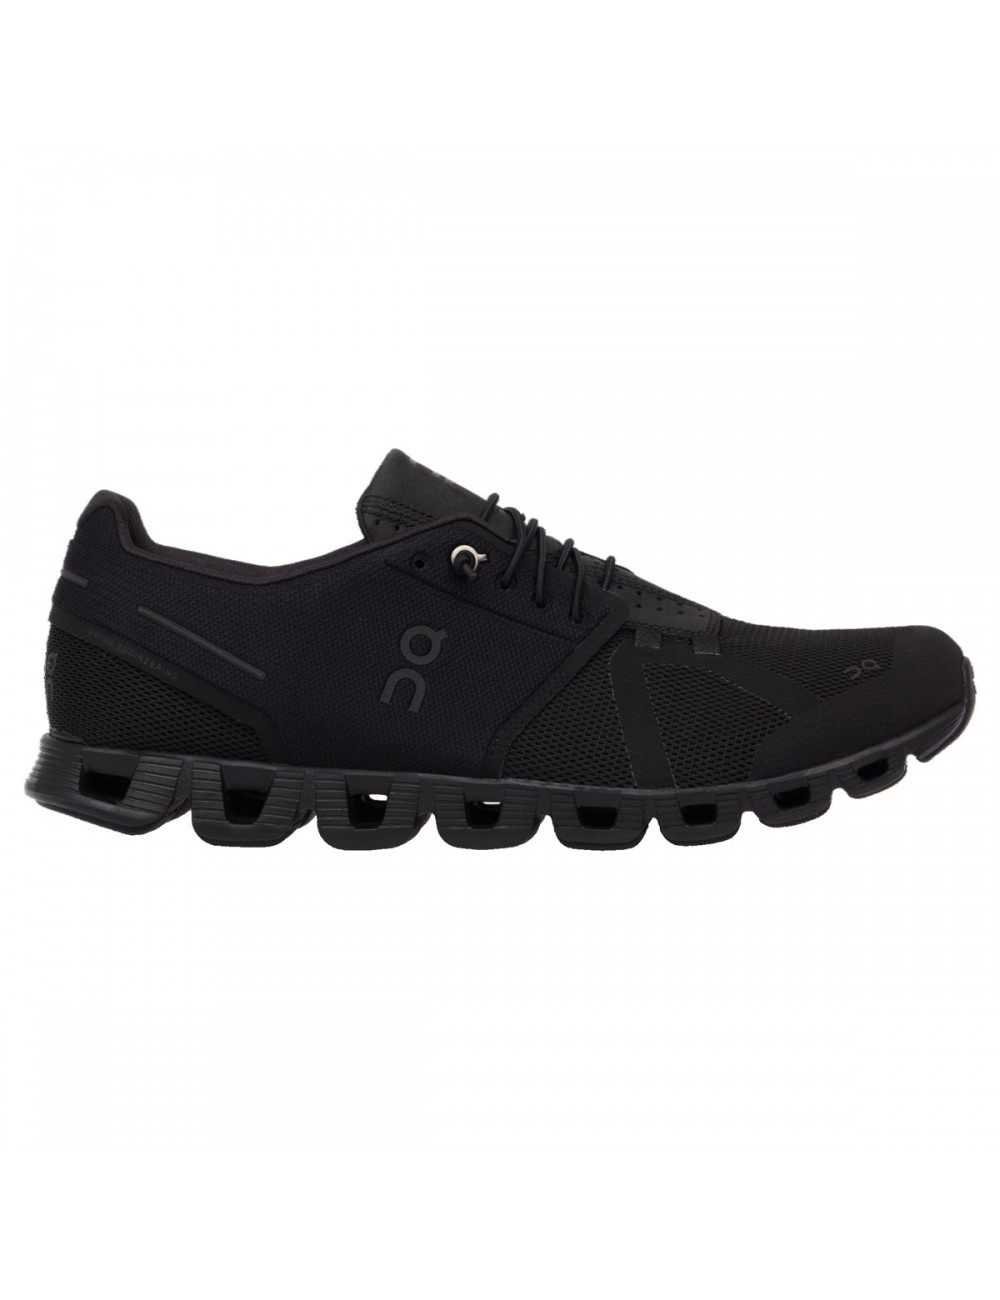 ON Cloud Shoe - All Black_10974